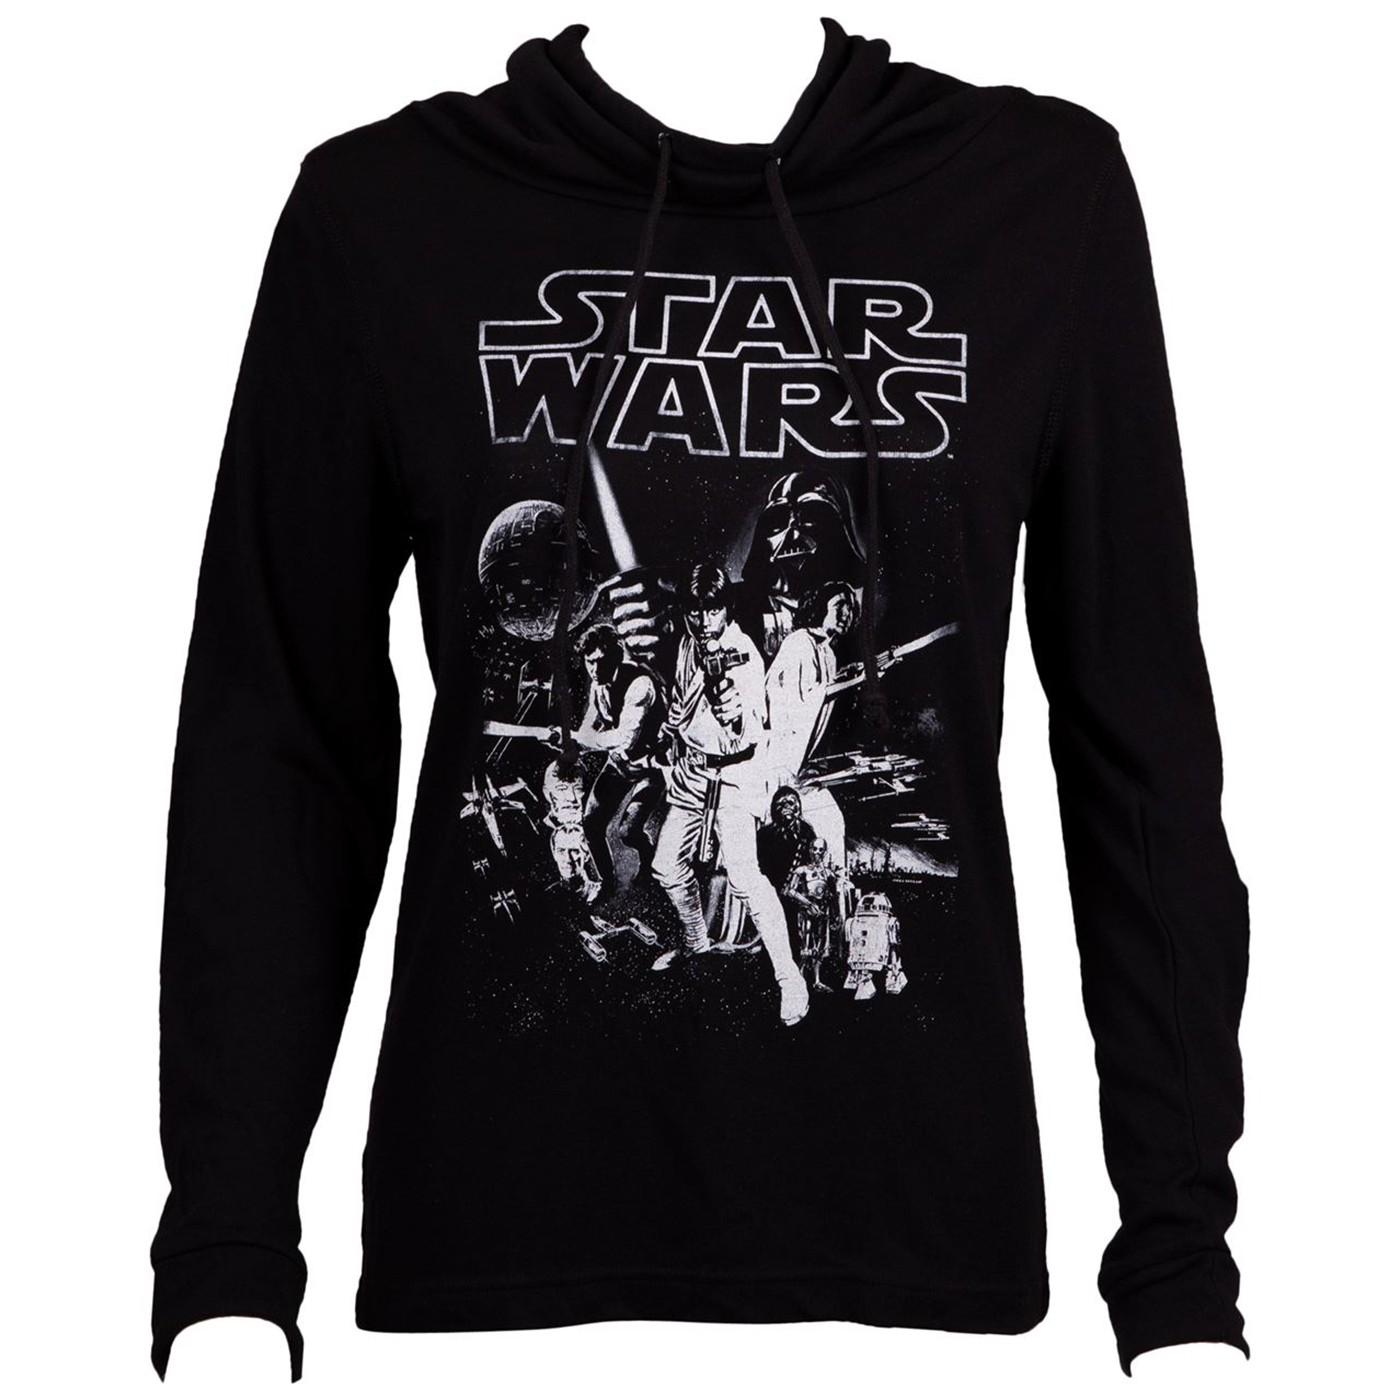 Star Wars New Hope Poster Long Sleeve Women's T-Shirt